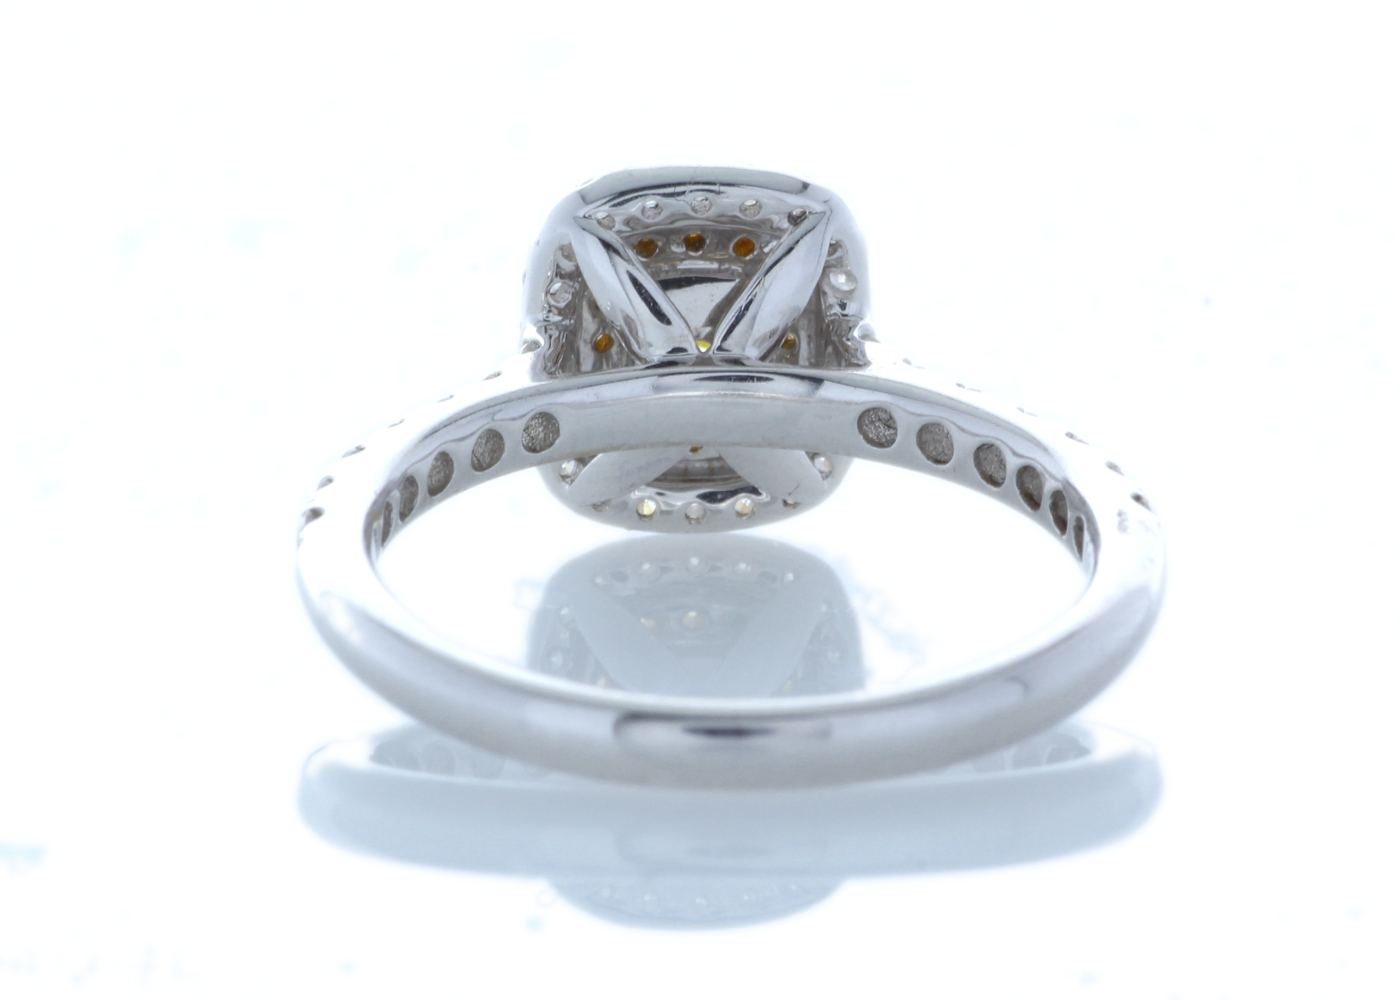 Lot 28 - 18ct White Gold Halo Set Ring 0.70 Carats